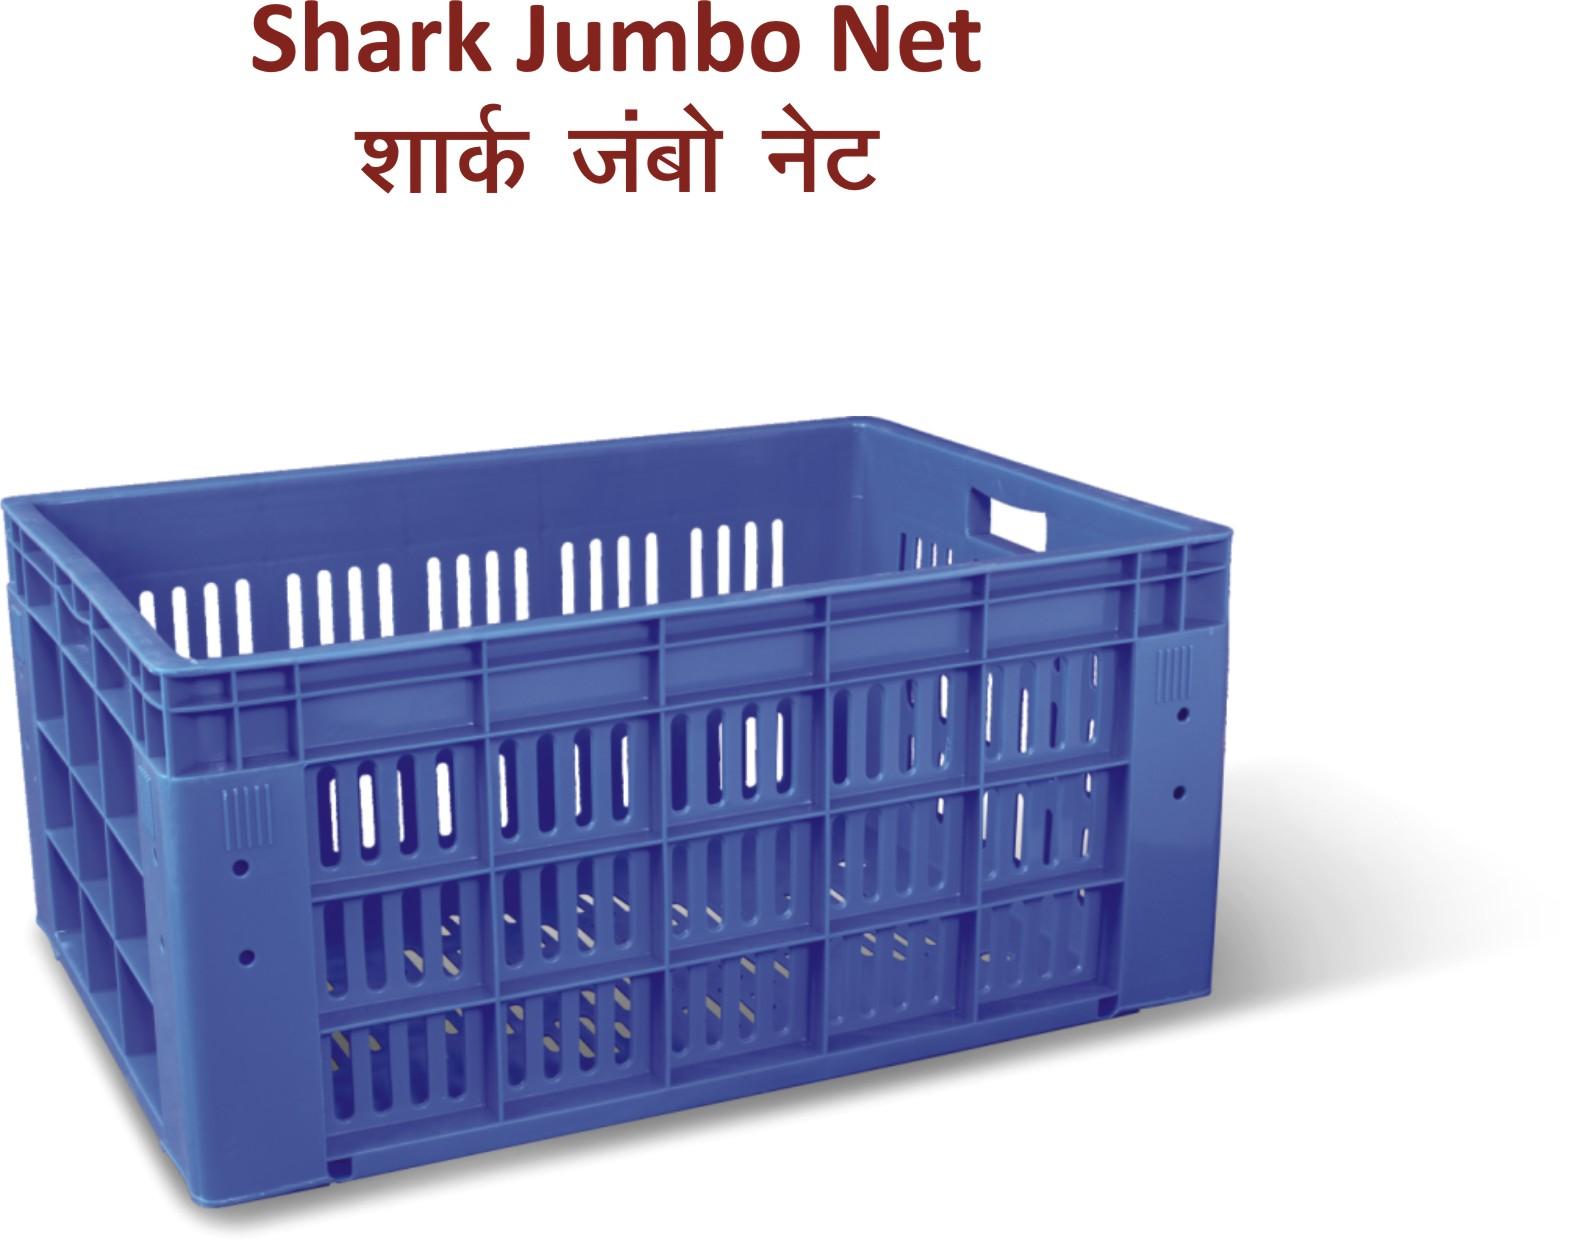 crate shark jumbo net